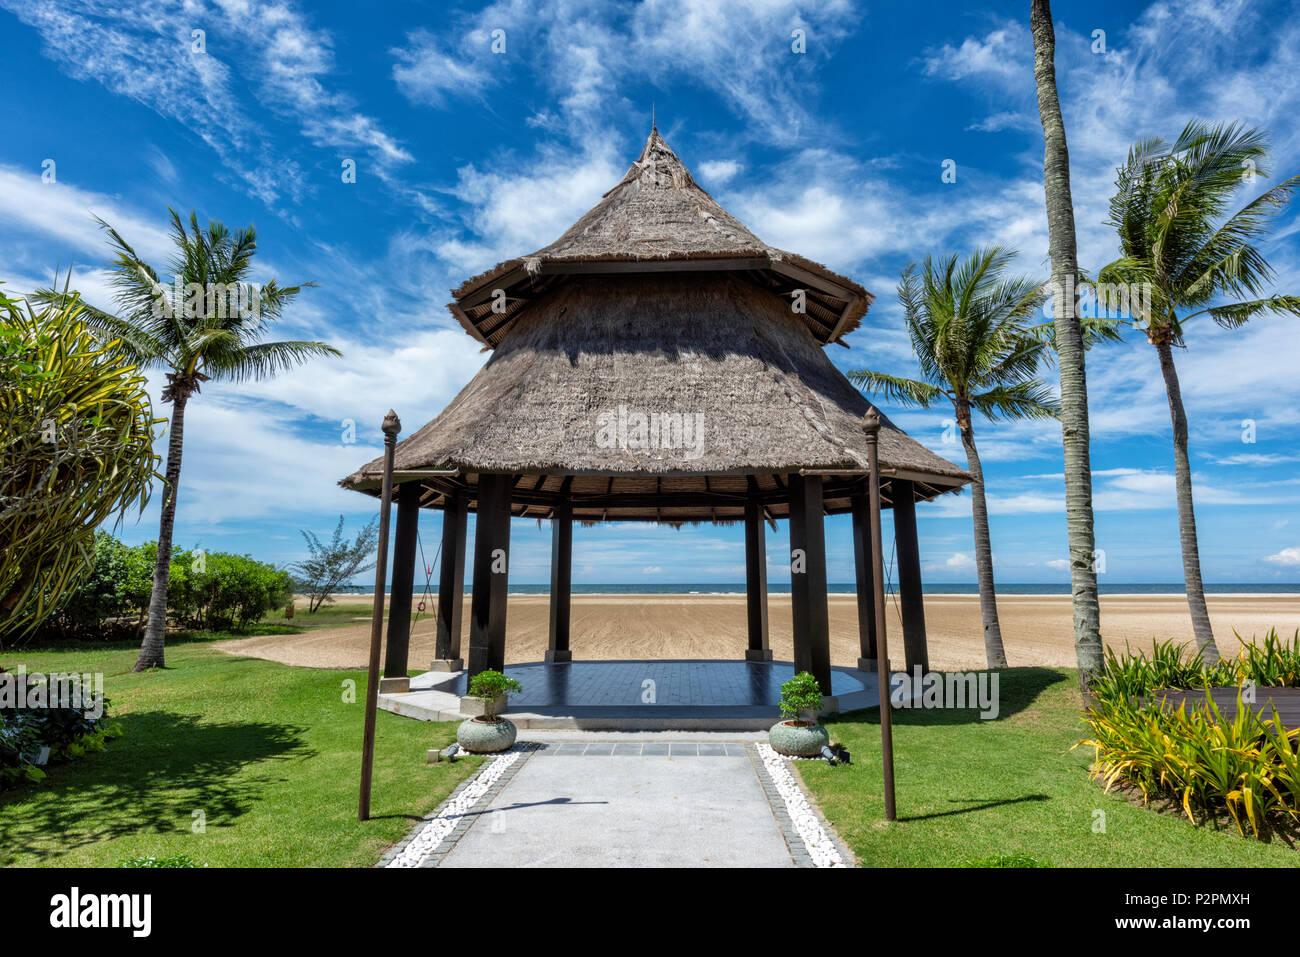 Gazebo nel terreno del Shangri La Rasa Ria Hotel a Kota Kinabalu, Borneo Malaysia Immagini Stock